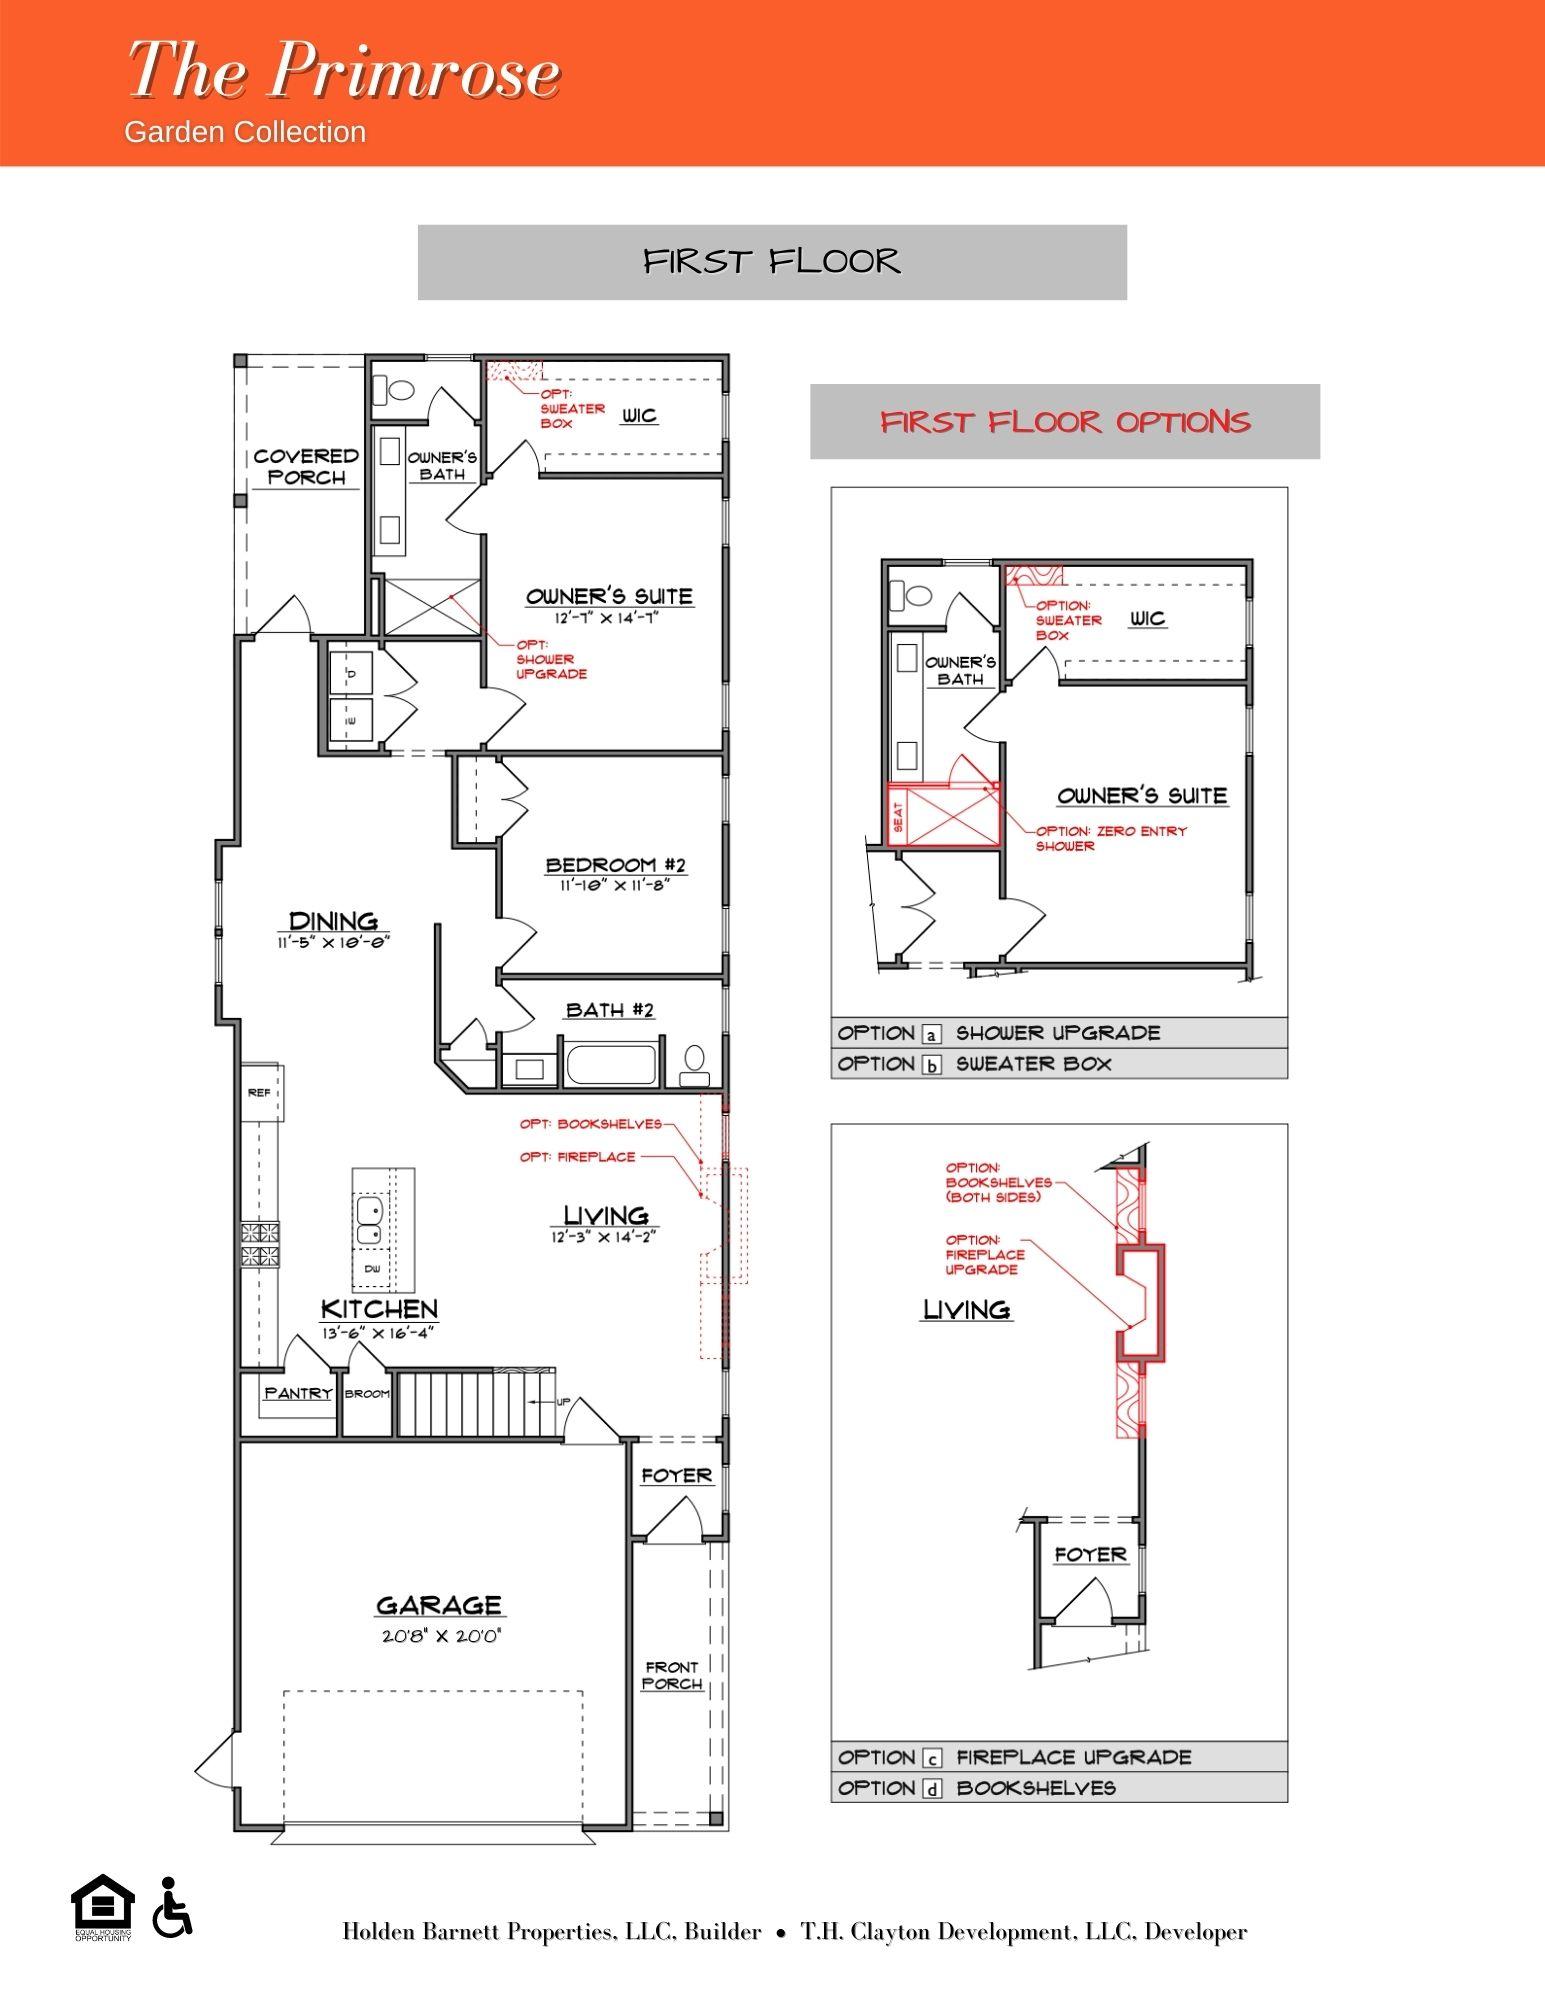 The Primrose First Floor Plan